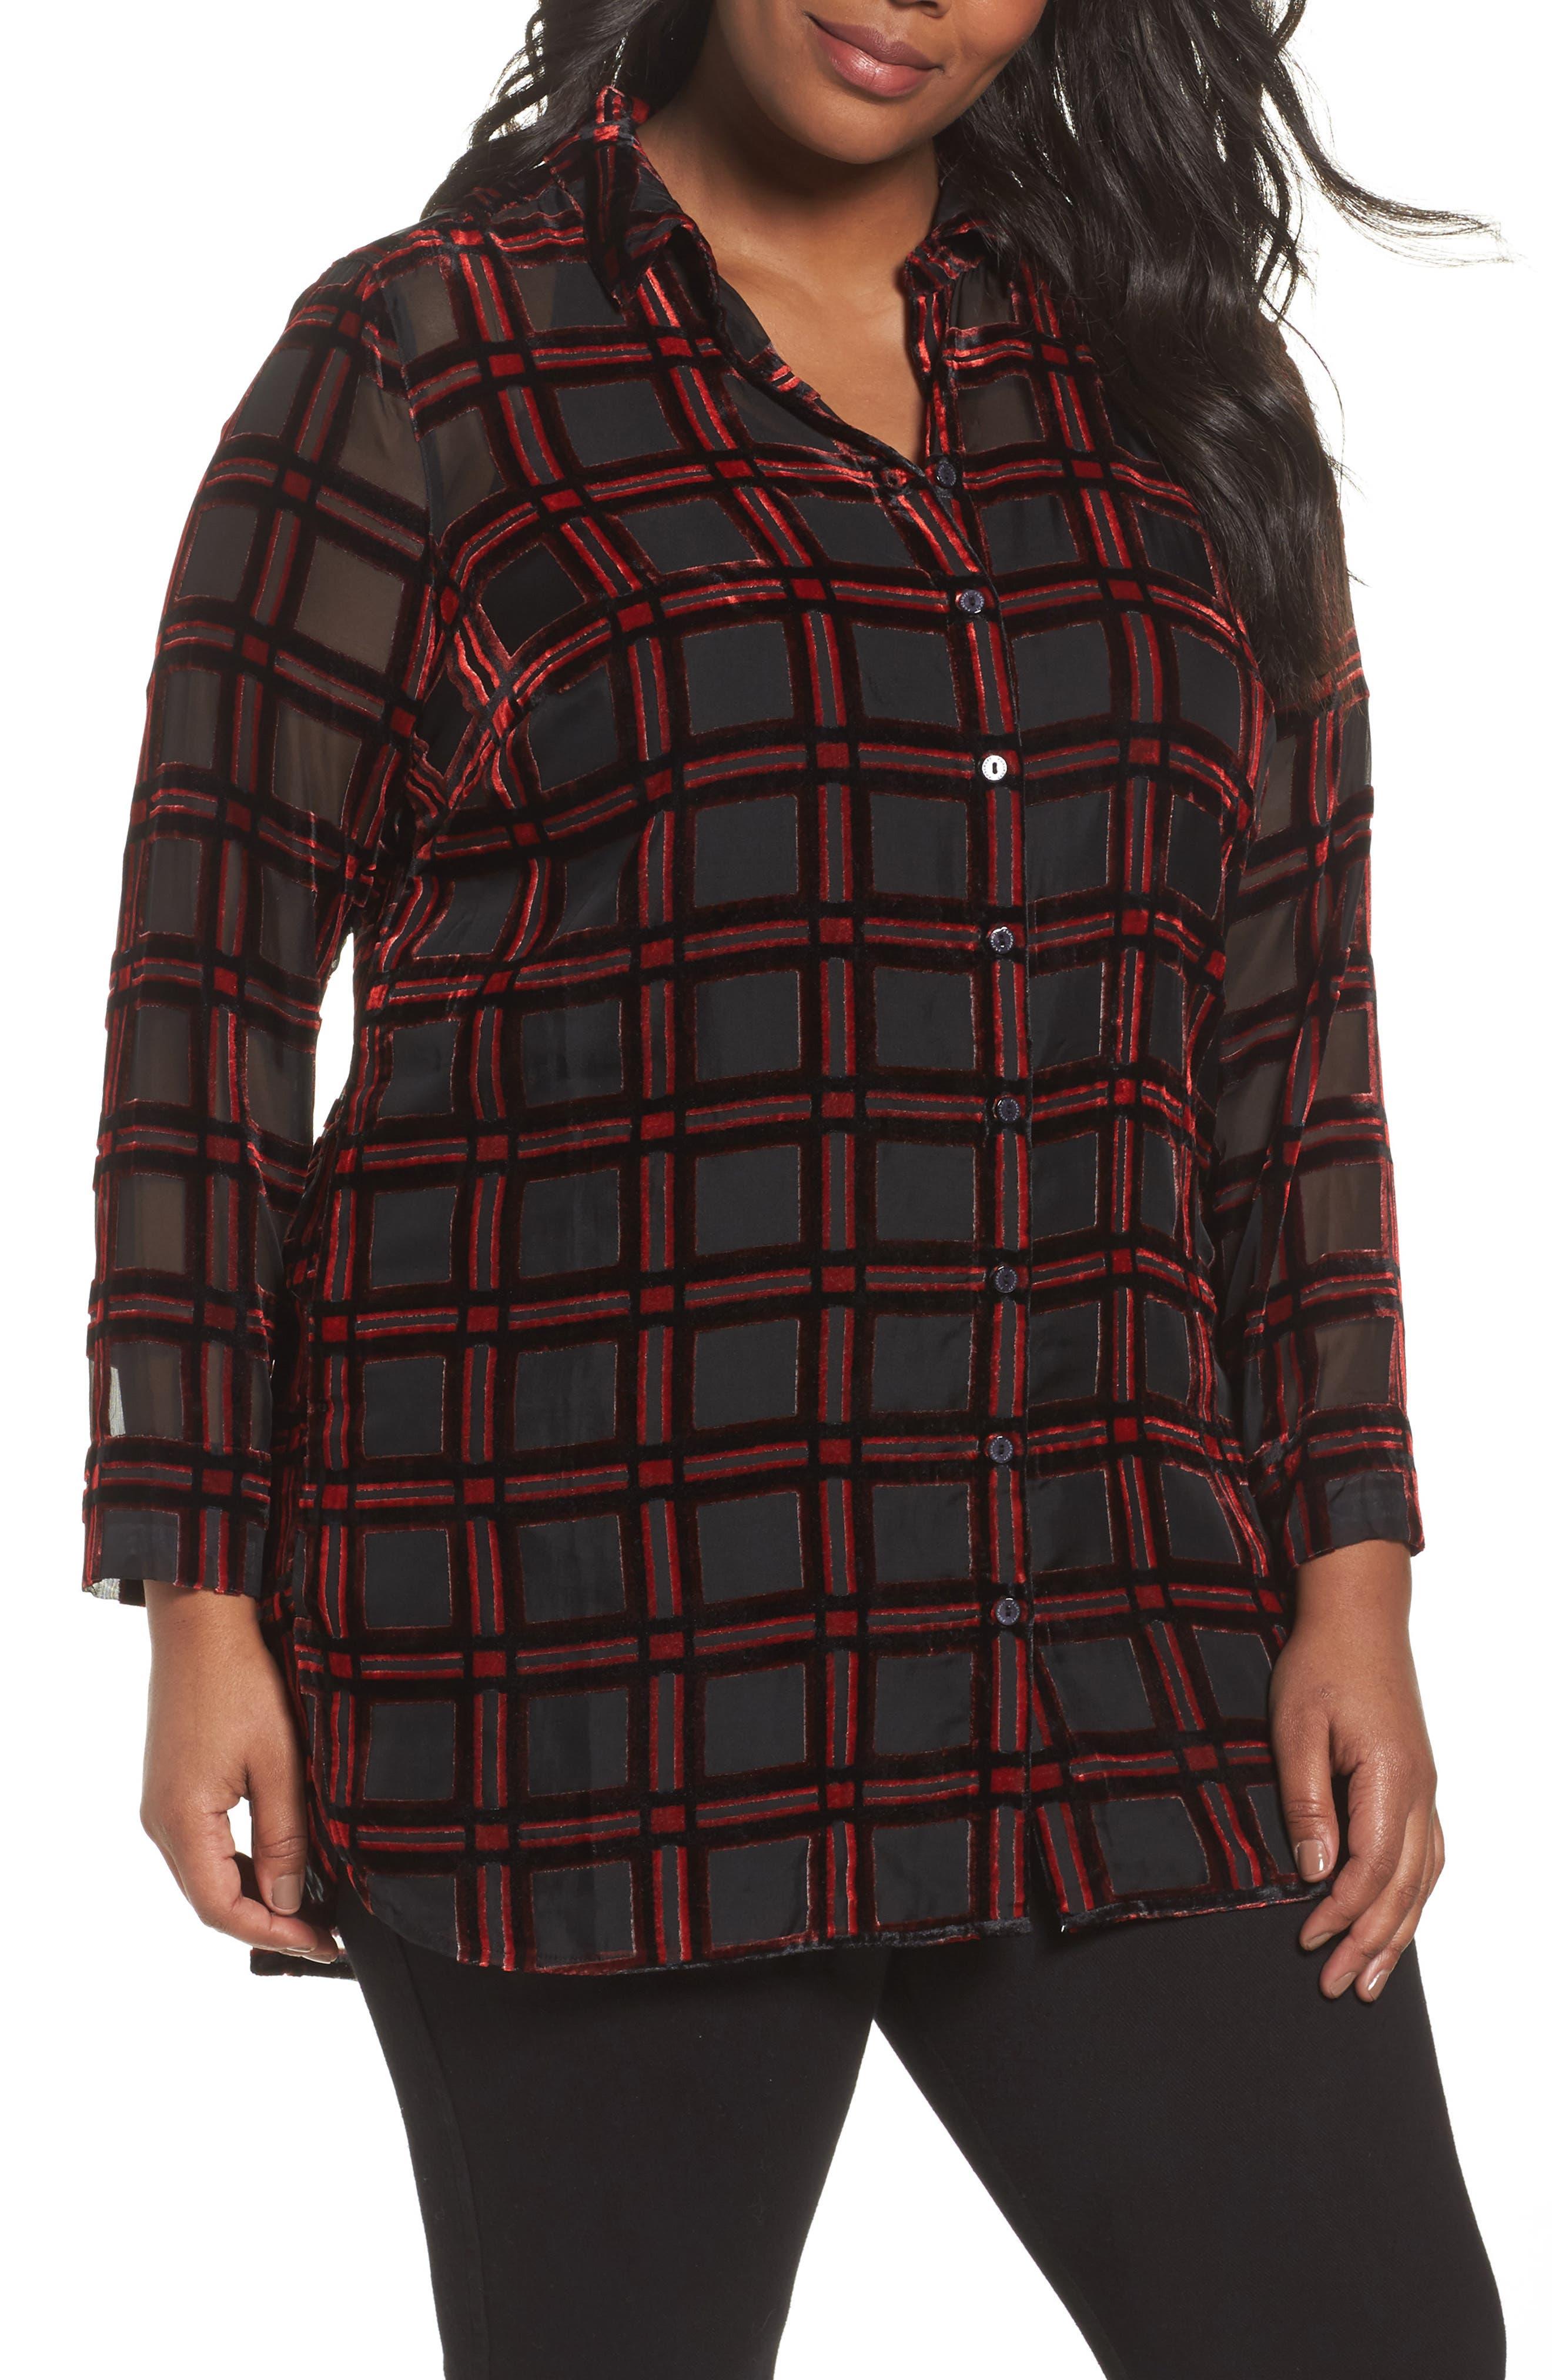 Alternate Image 1 Selected - Foxcroft Jade Burnout Tartan Shirt (Plus Size)